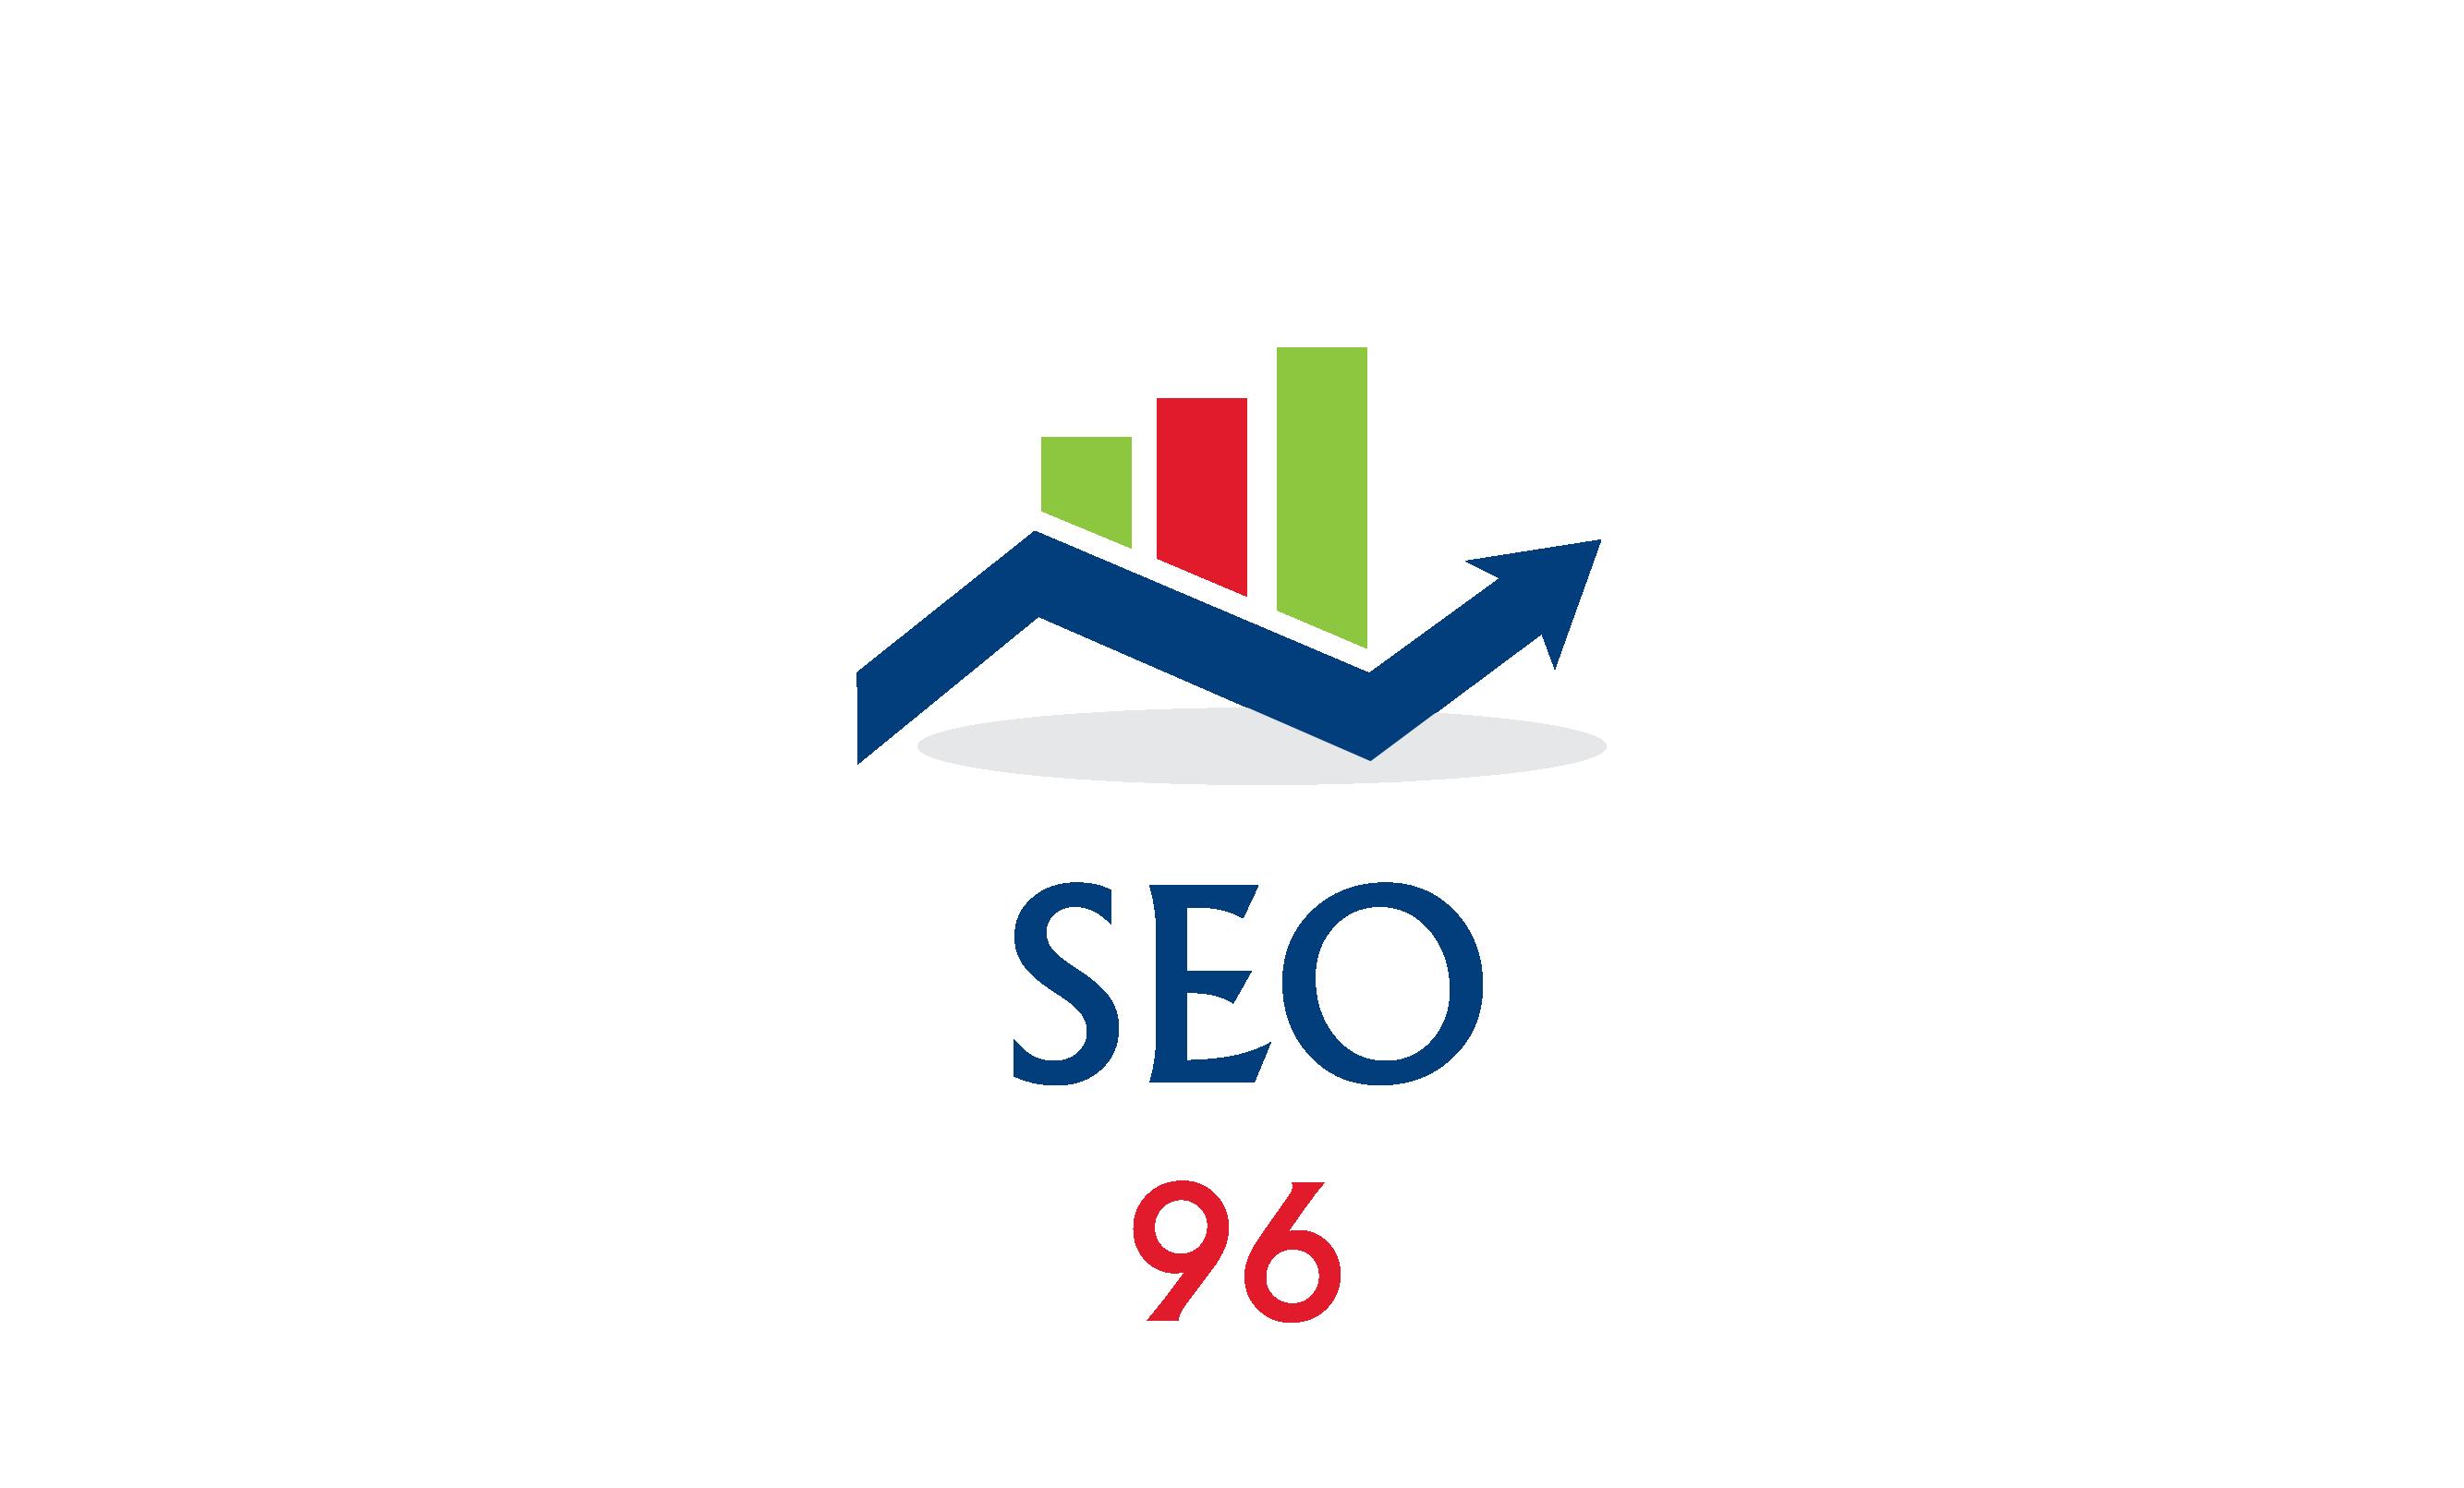 SEO 96